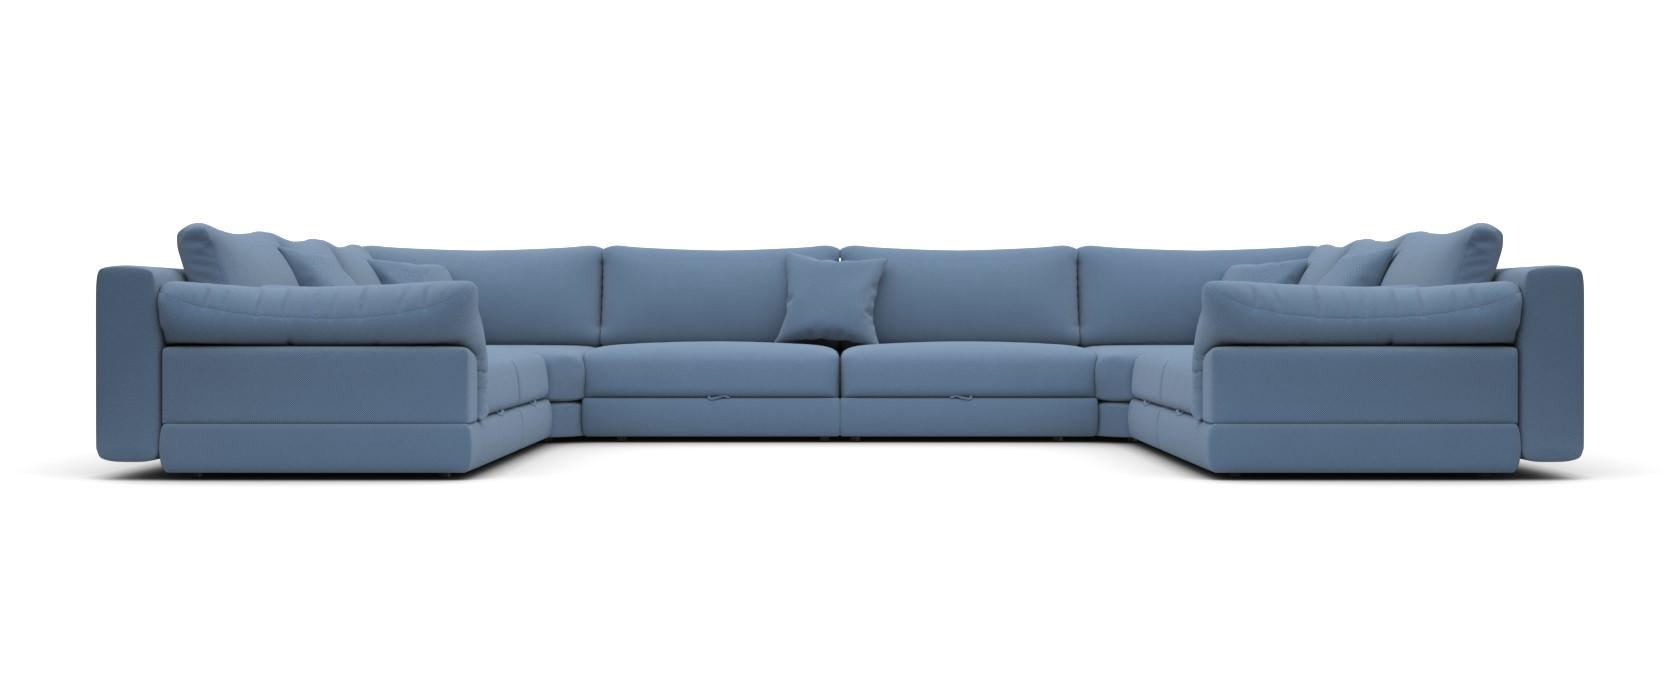 Модульний диван Claudia 440x355 - Pufetto